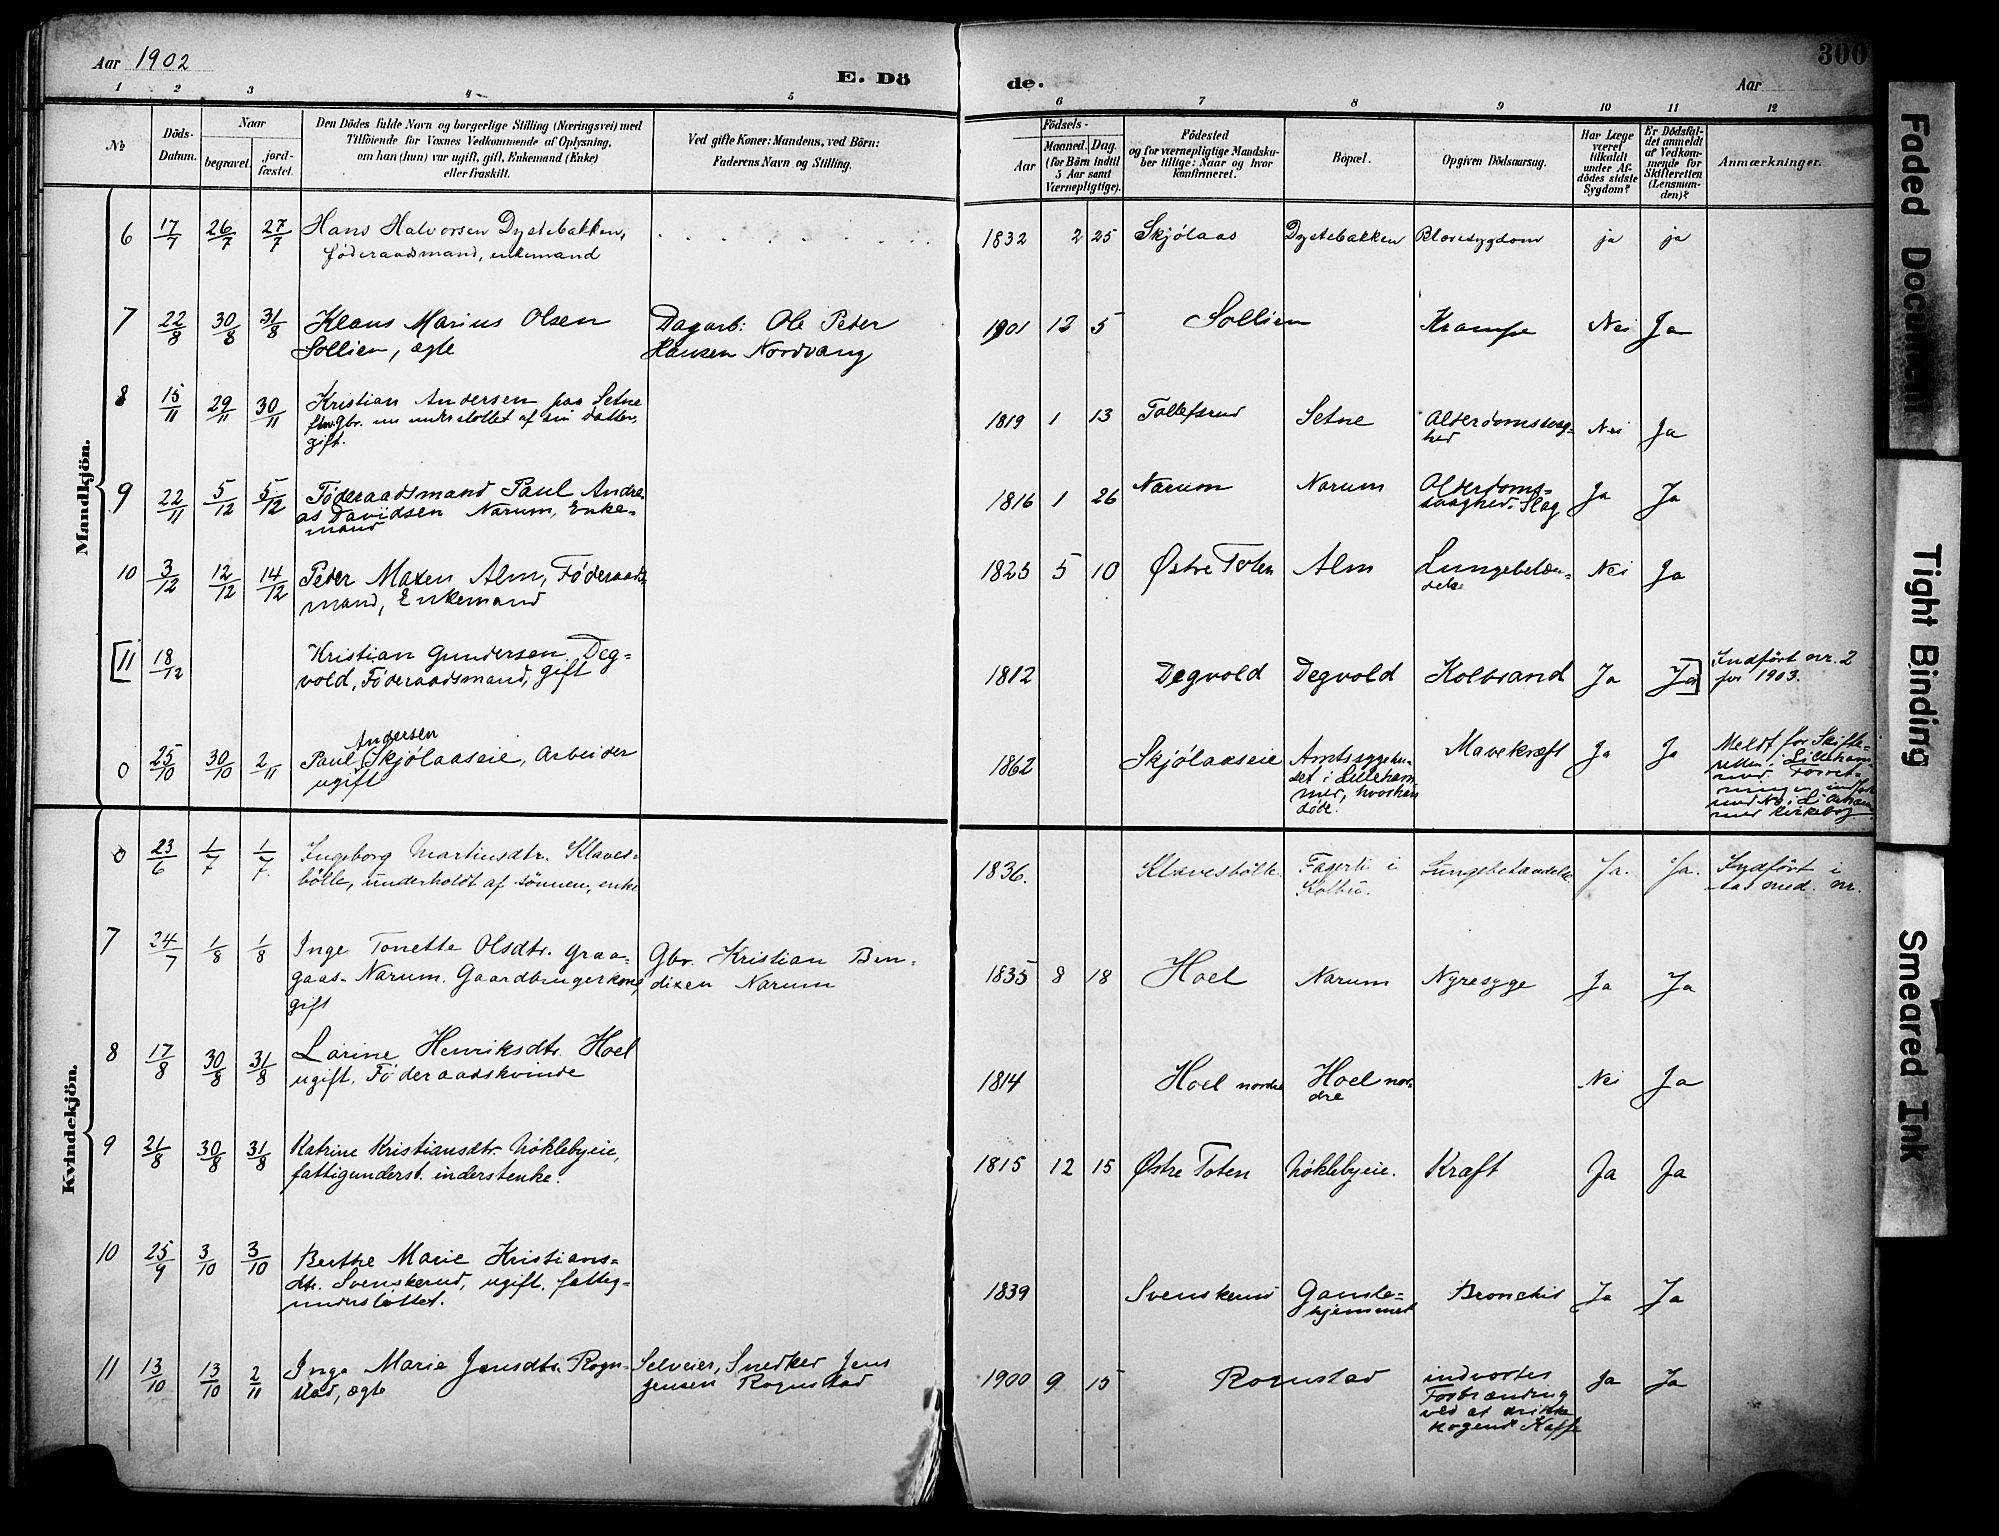 SAH, Vestre Toten prestekontor, H/Ha/Haa/L0013: Ministerialbok nr. 13, 1895-1911, s. 300